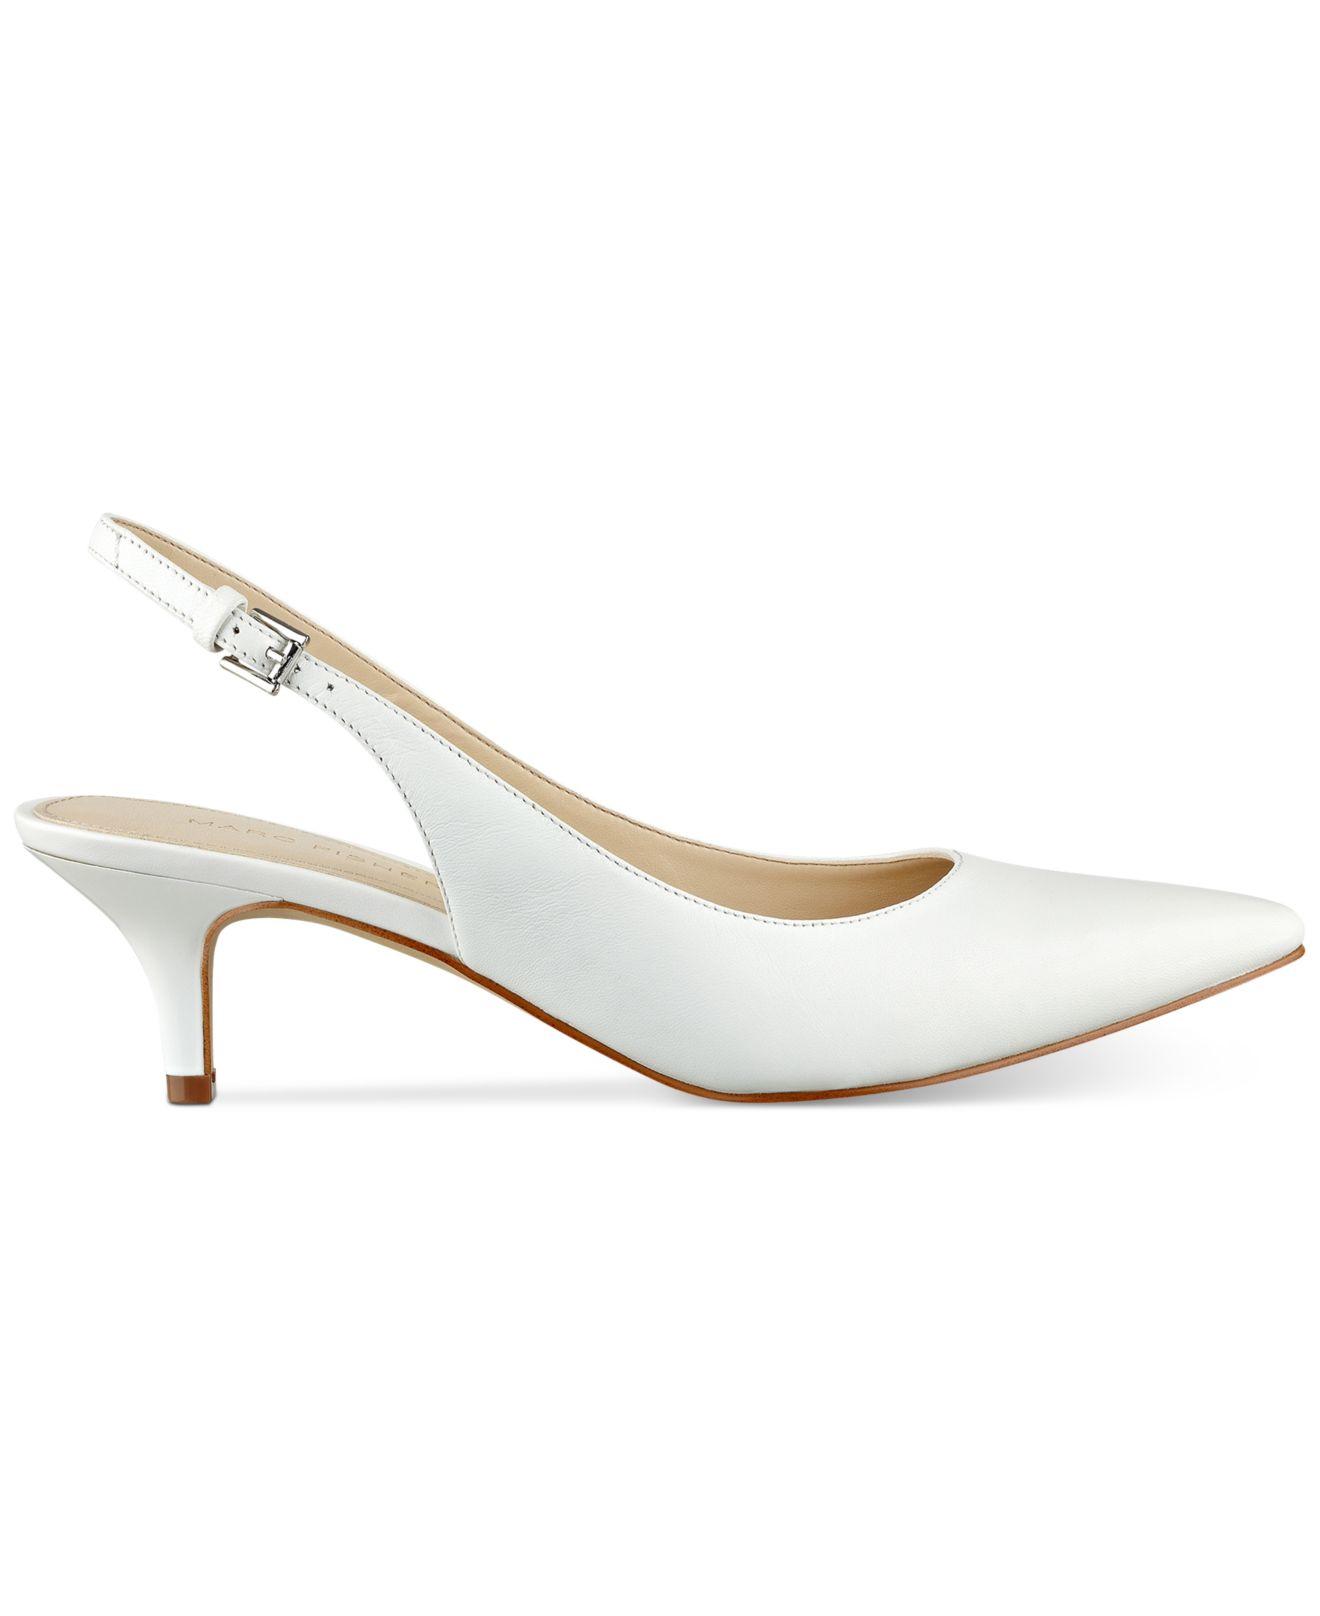 ab0c25b3497 Lyst - Marc Fisher Tiffani Kitten-heel Slingback Pumps in White